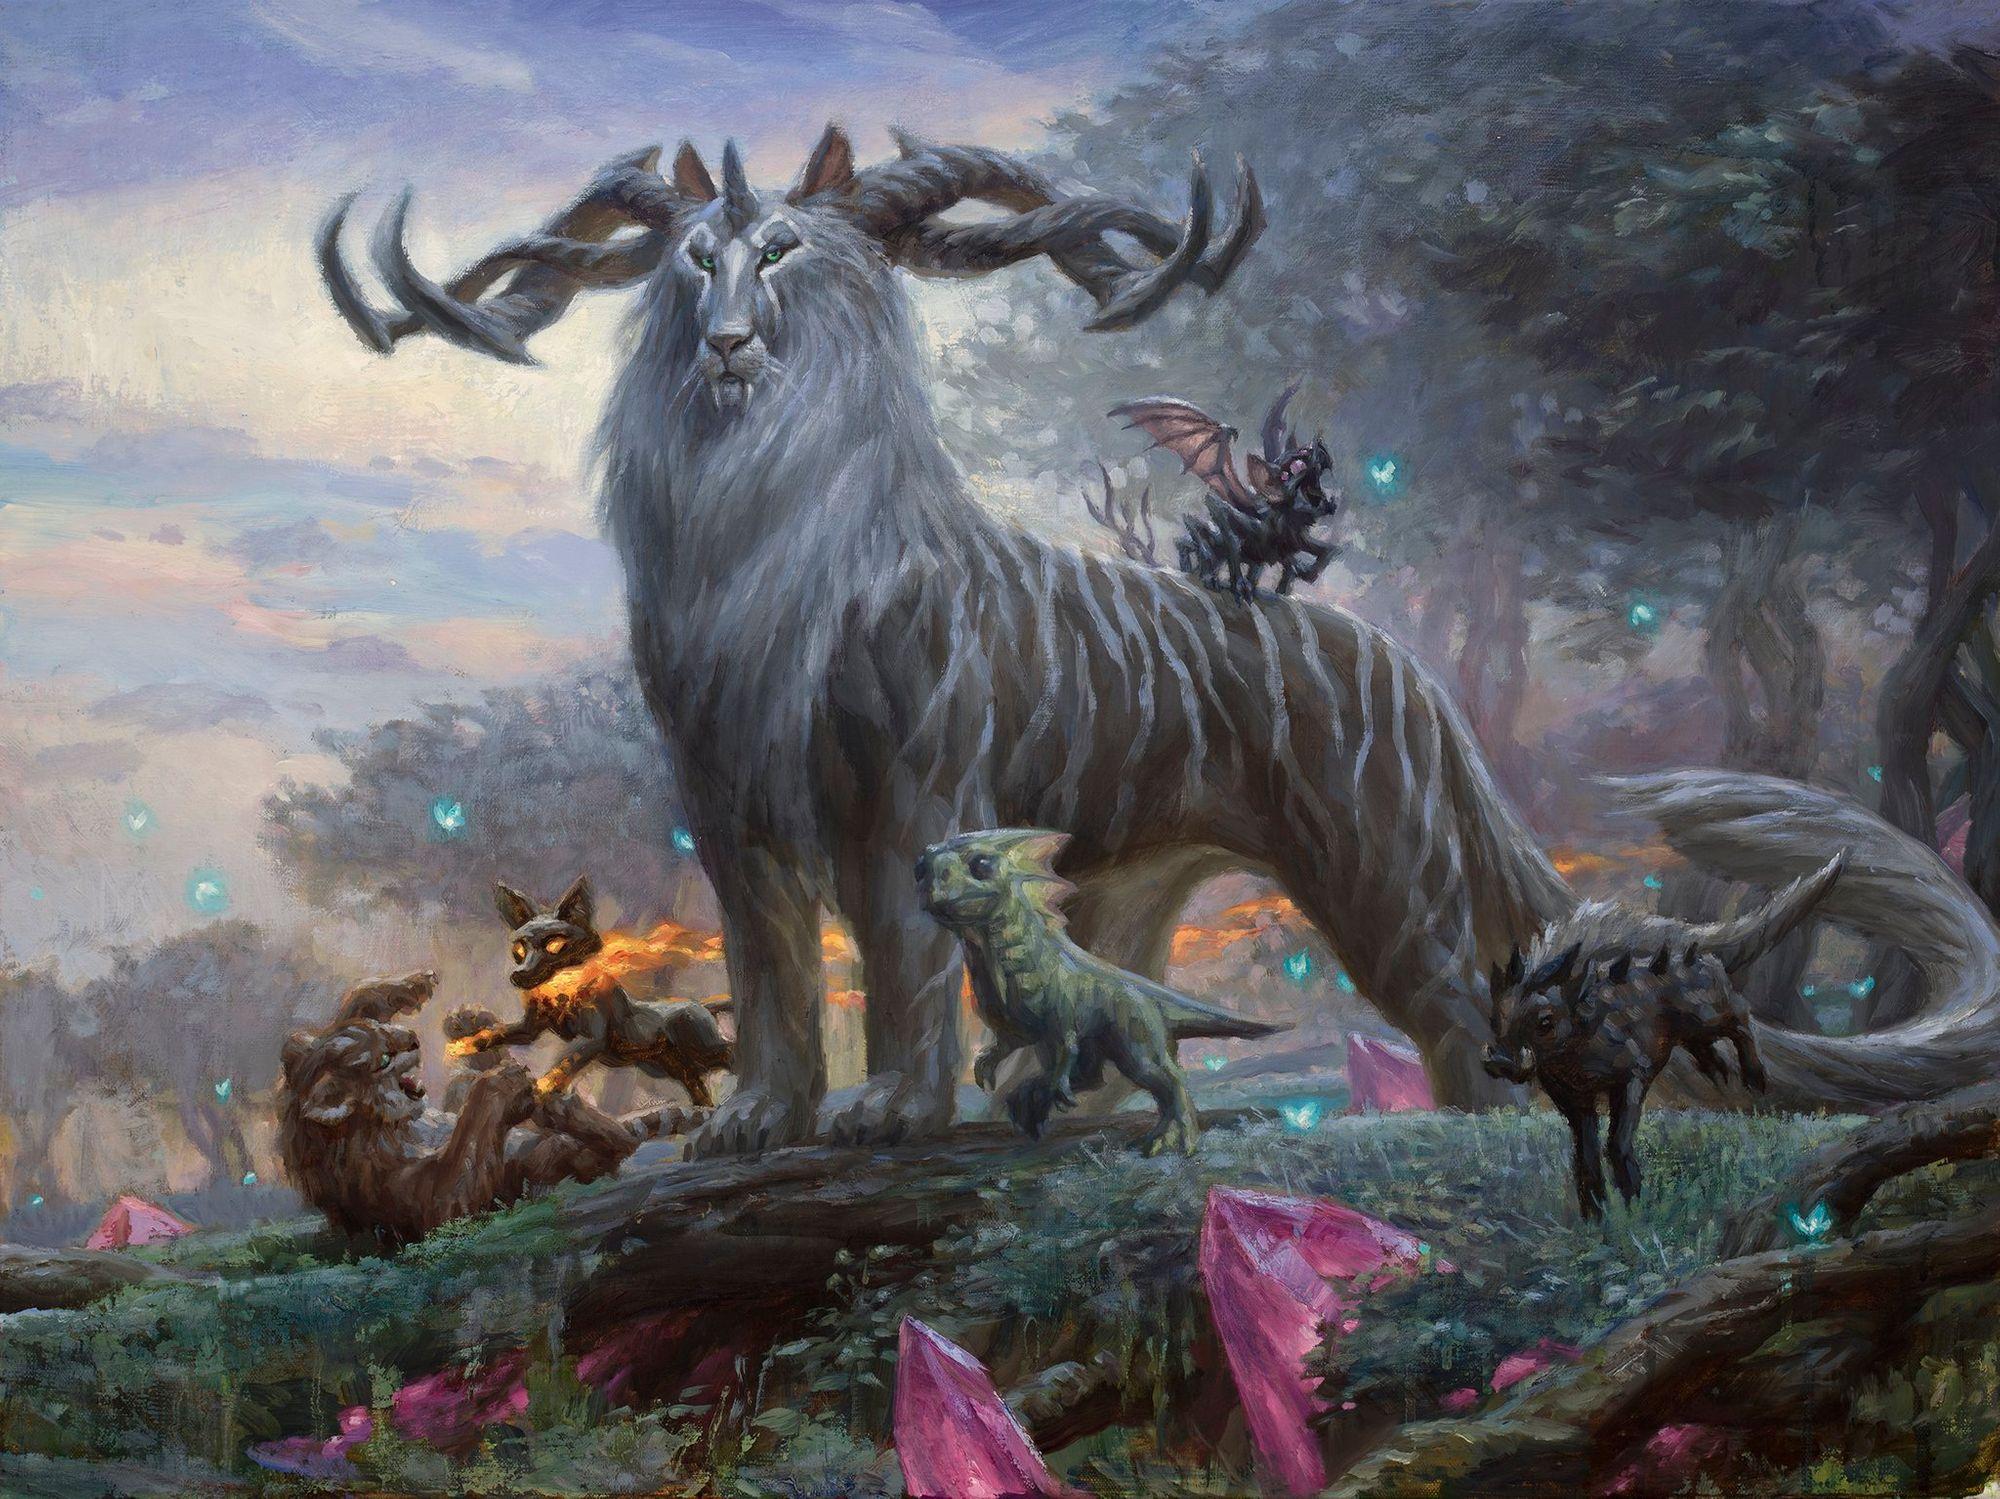 No-Tribe Tribal: Kaheera Elementals in Standard